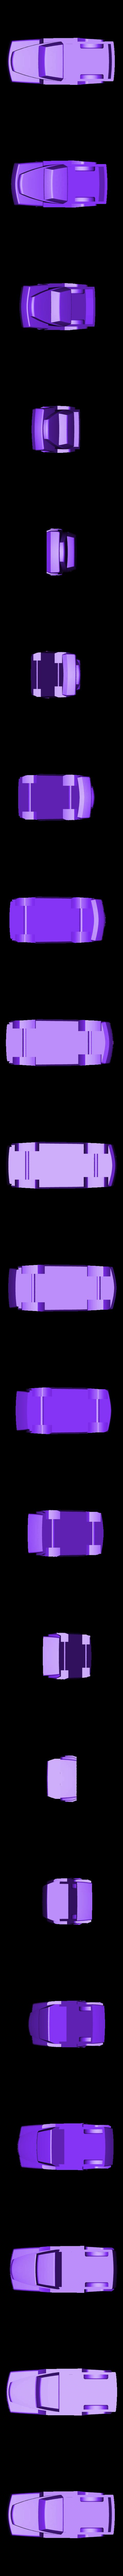 Truck_lowered_body.stl Download free STL file Pickup Truck • 3D printable template, WallTosh